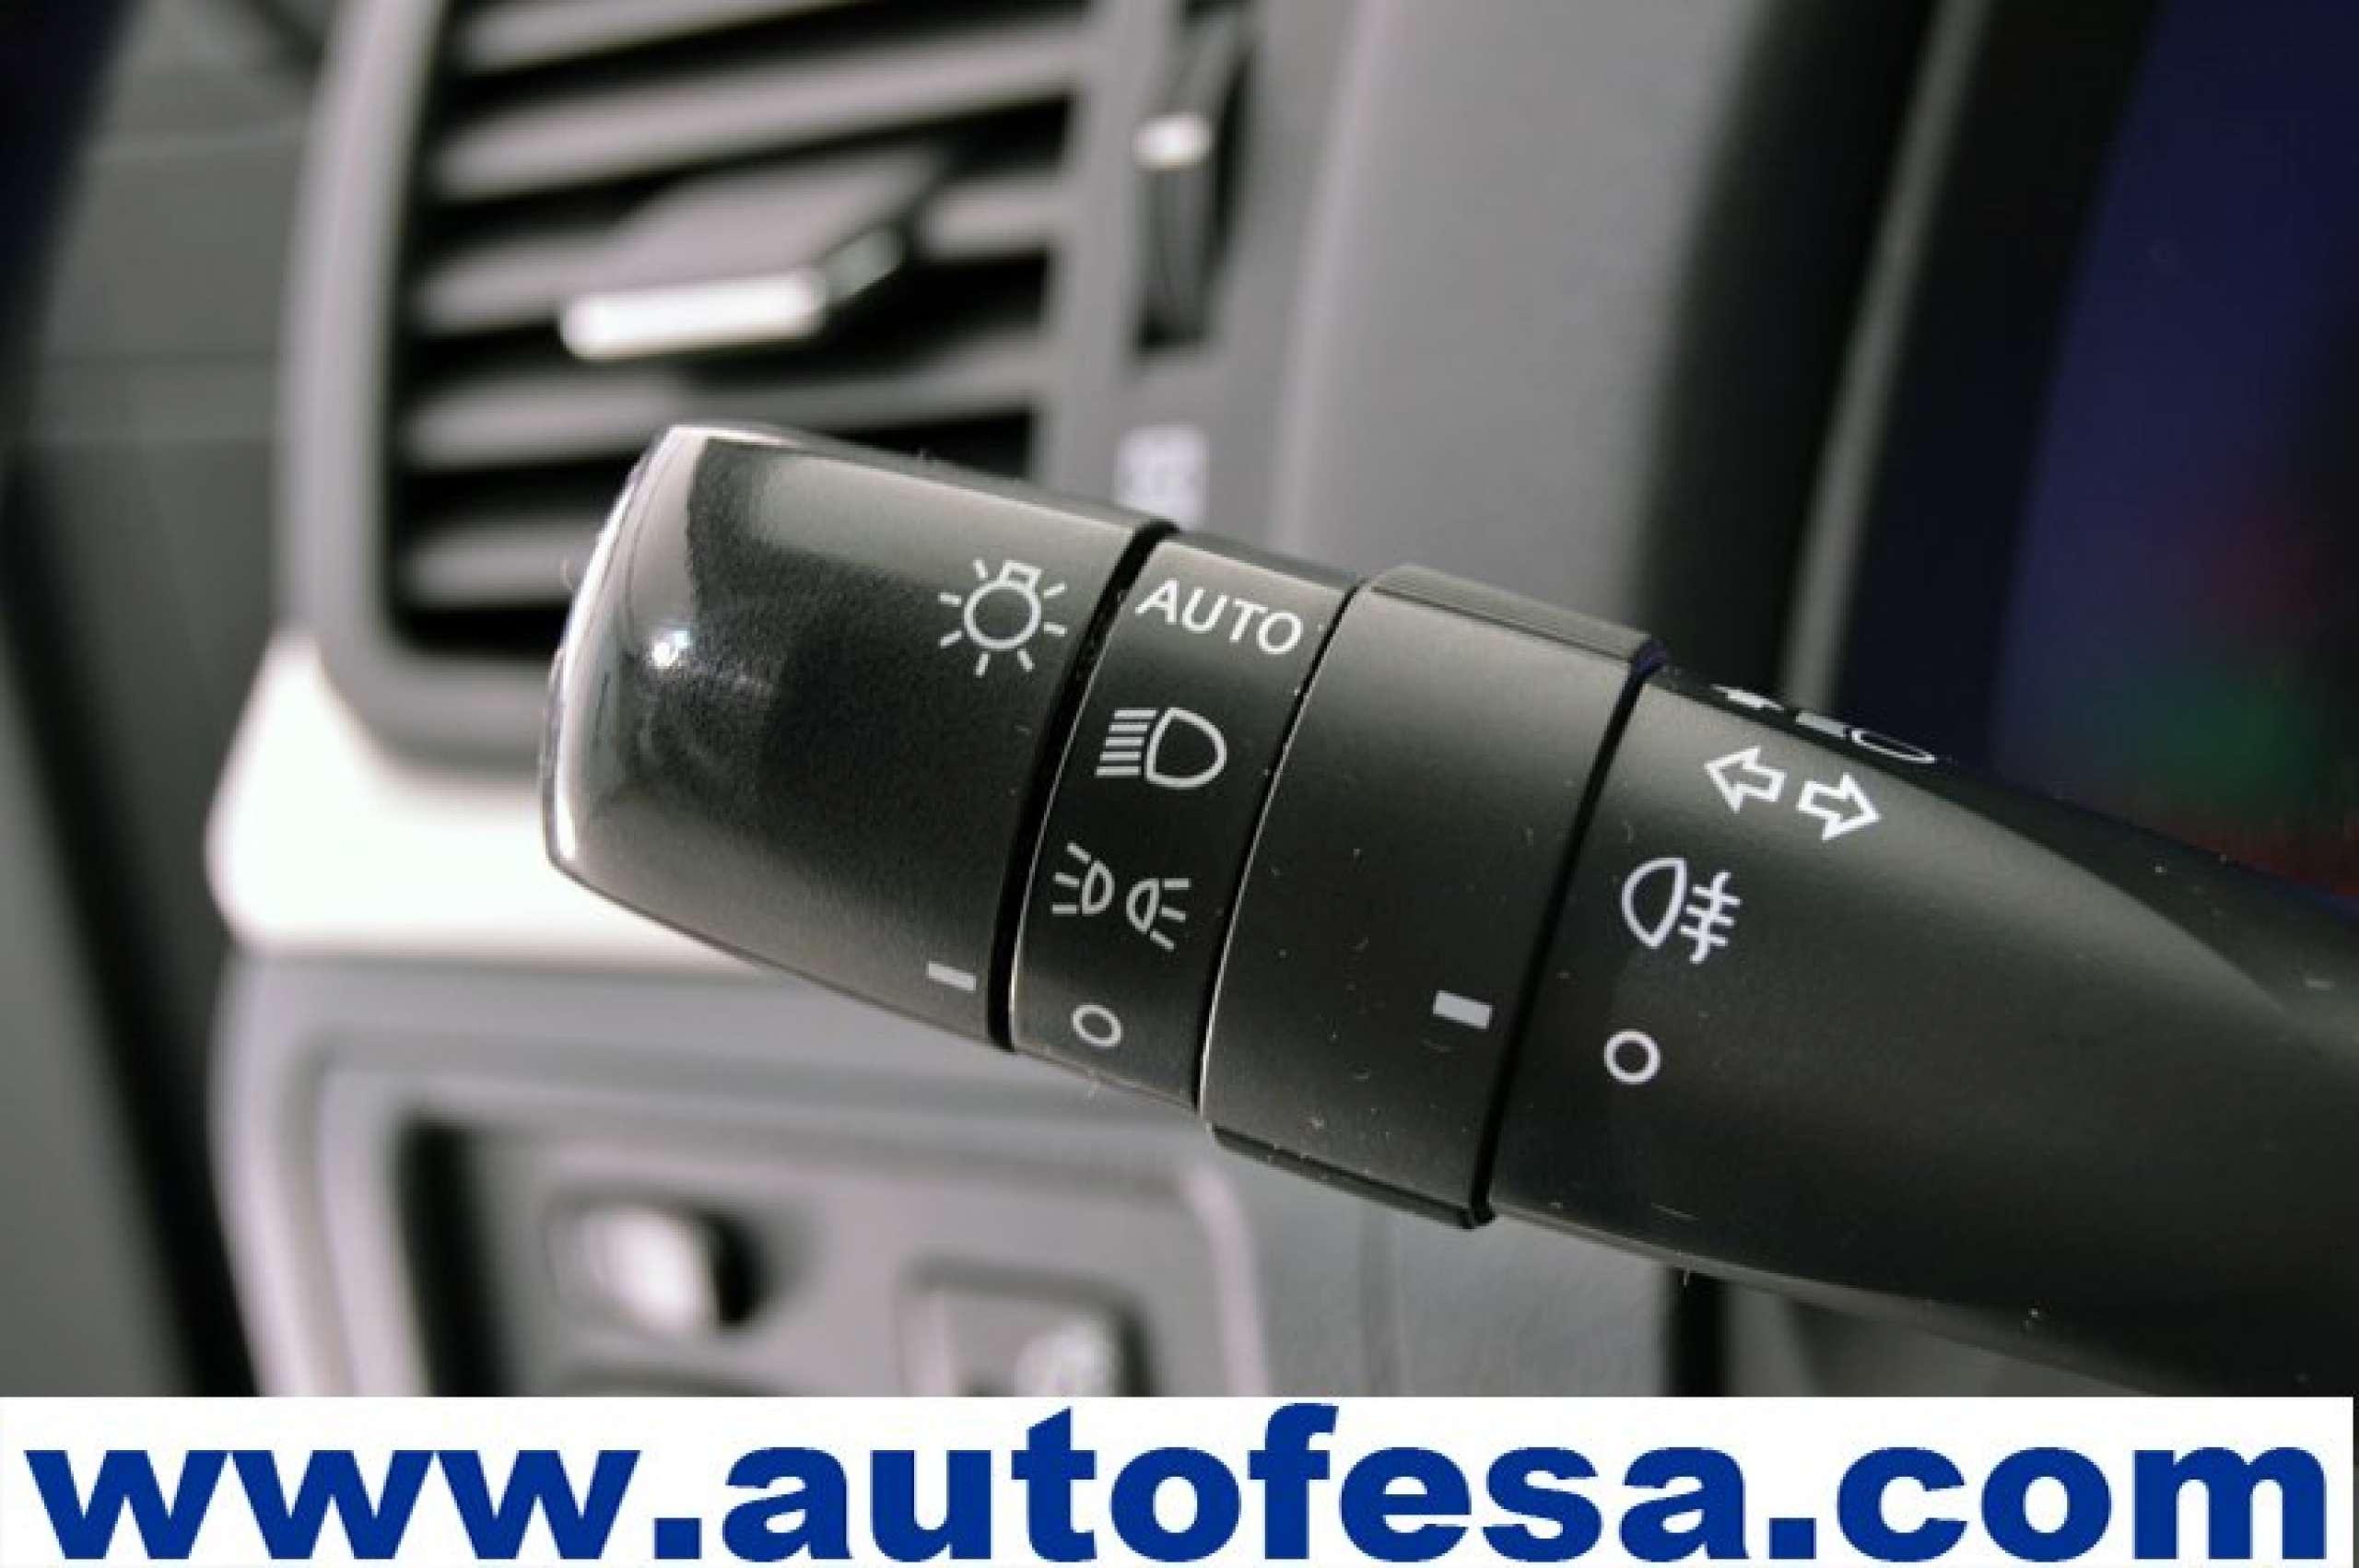 Lexus Ct 200h 1.8 136cv Eco Auto 5p - Foto 27